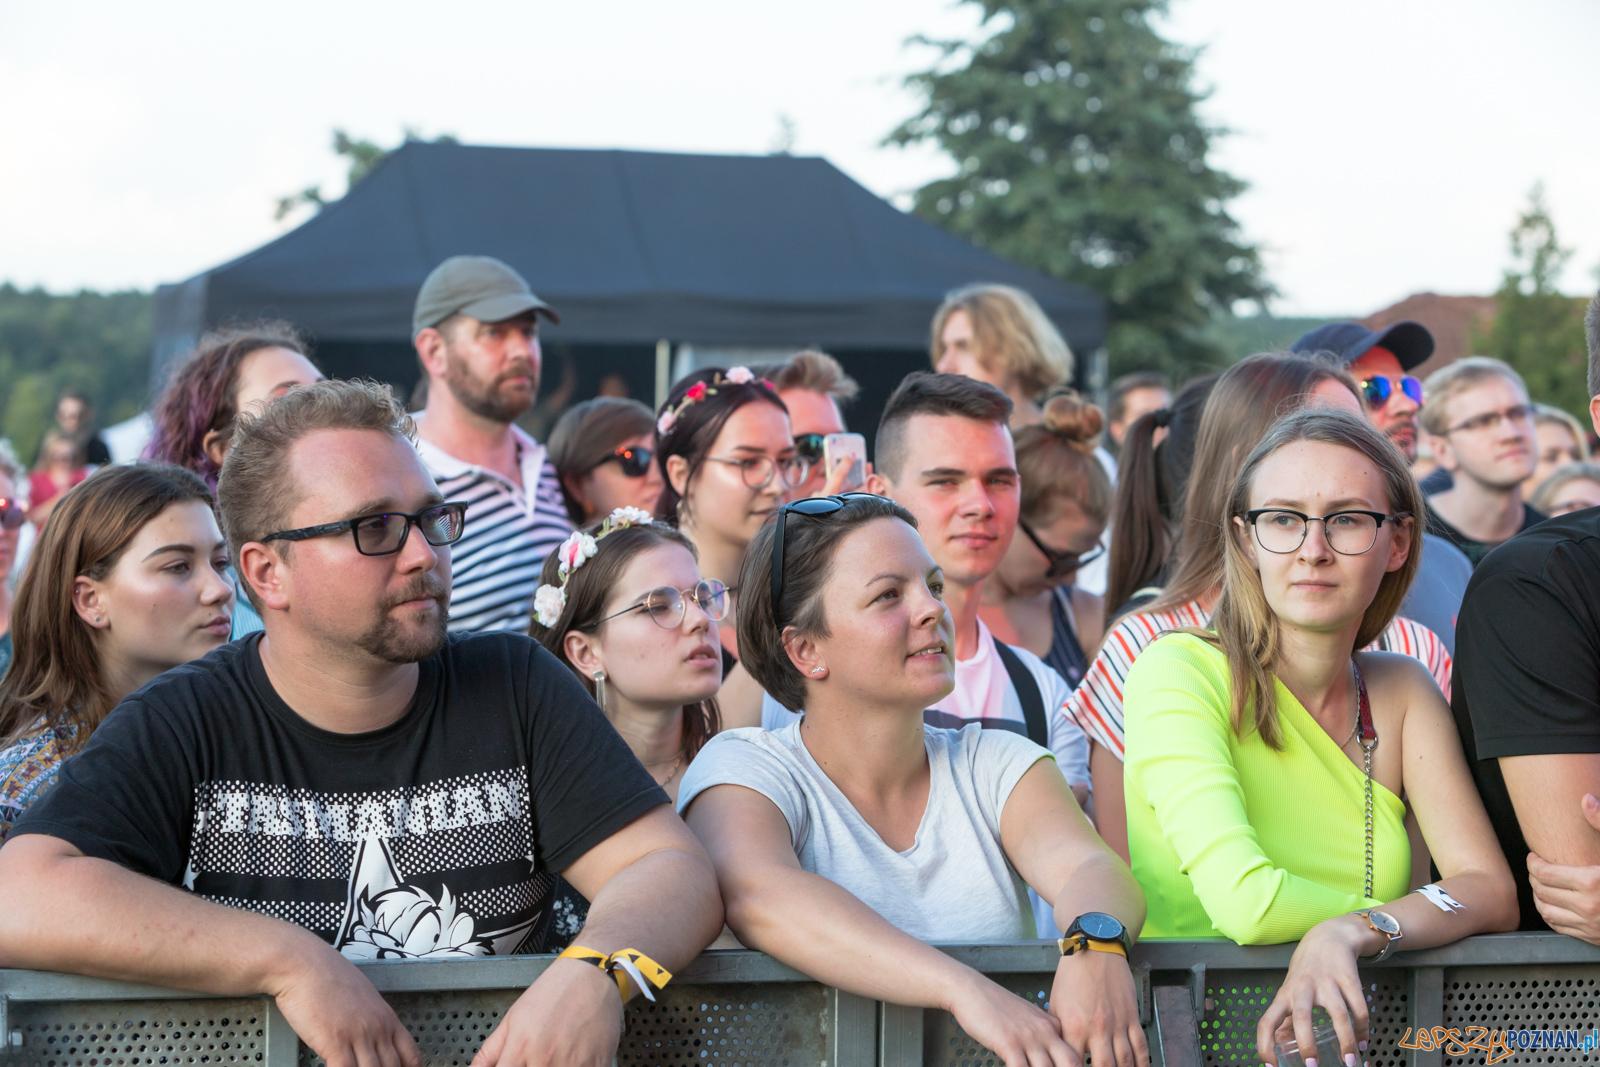 Edison Festival - Taste The Music  Foto: lepszyPOZNAN.pl/Piotr Rychter